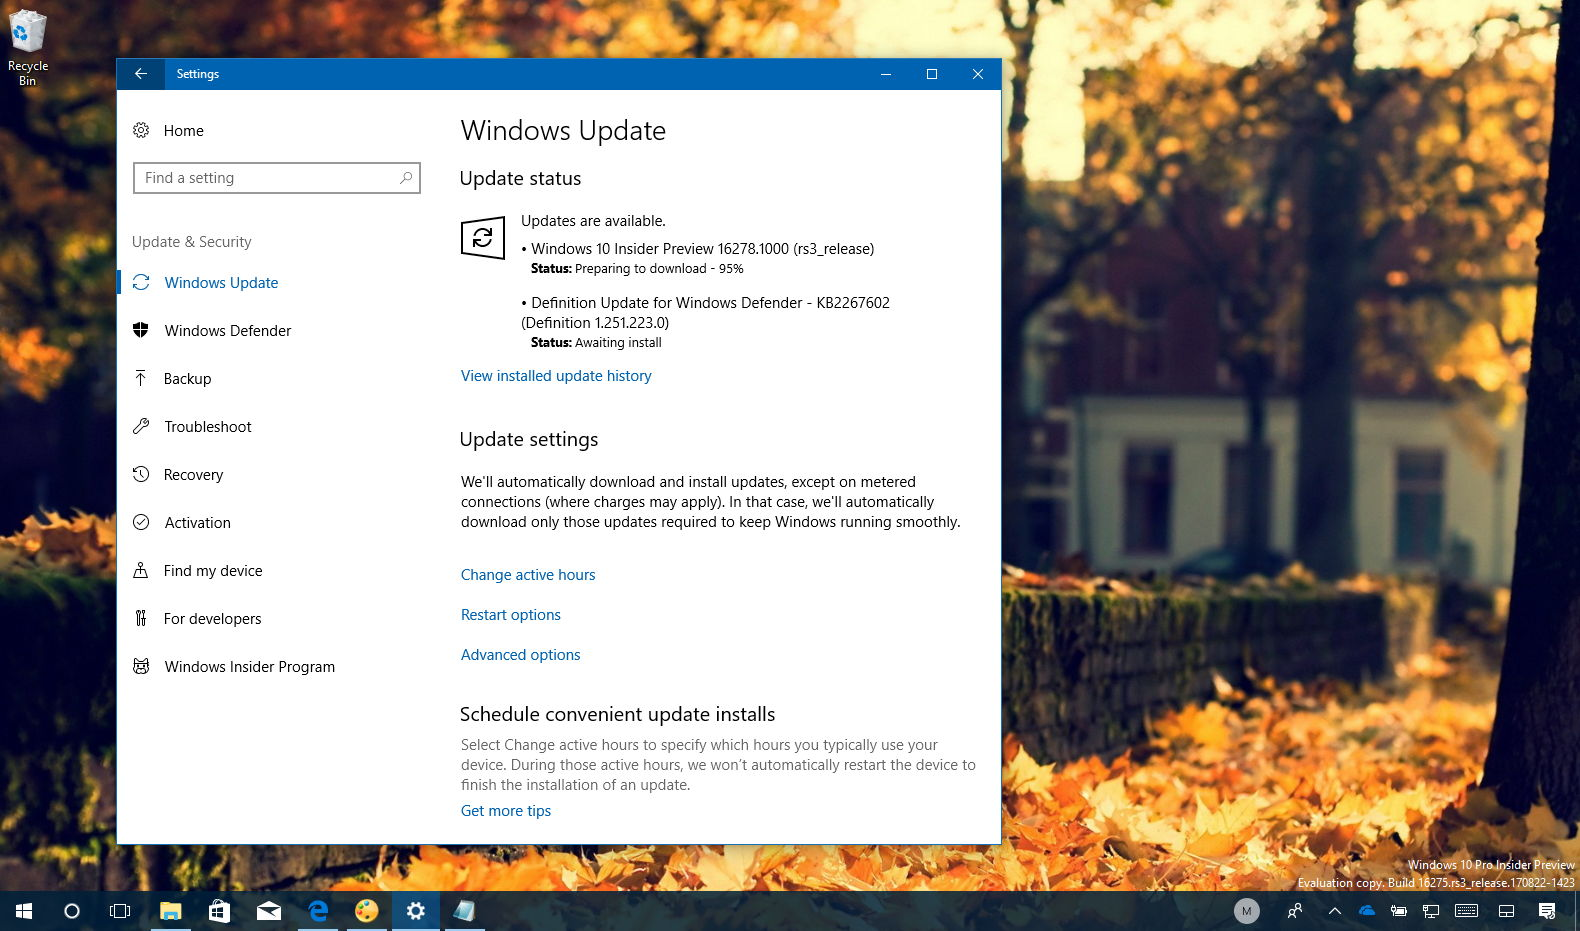 Windows 10 build 16278